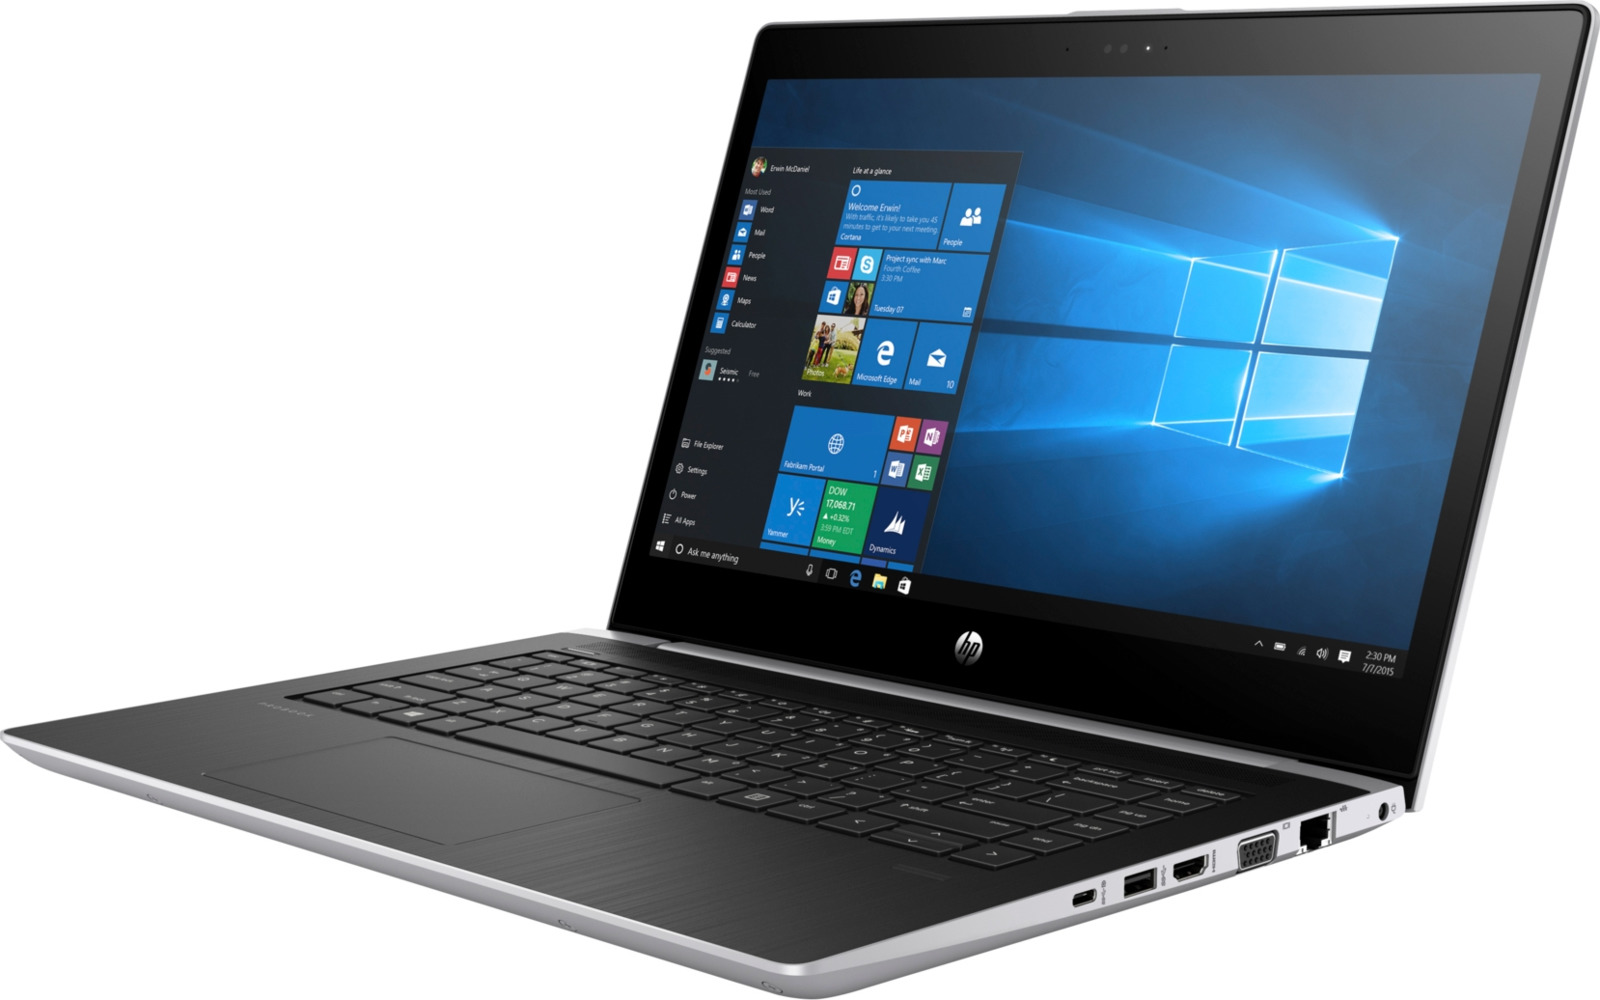 14 Ноутбук HP ProBook 440 G5 4WV57EA, серебристый ноутбук hp probook 440 g5 2rs39ea